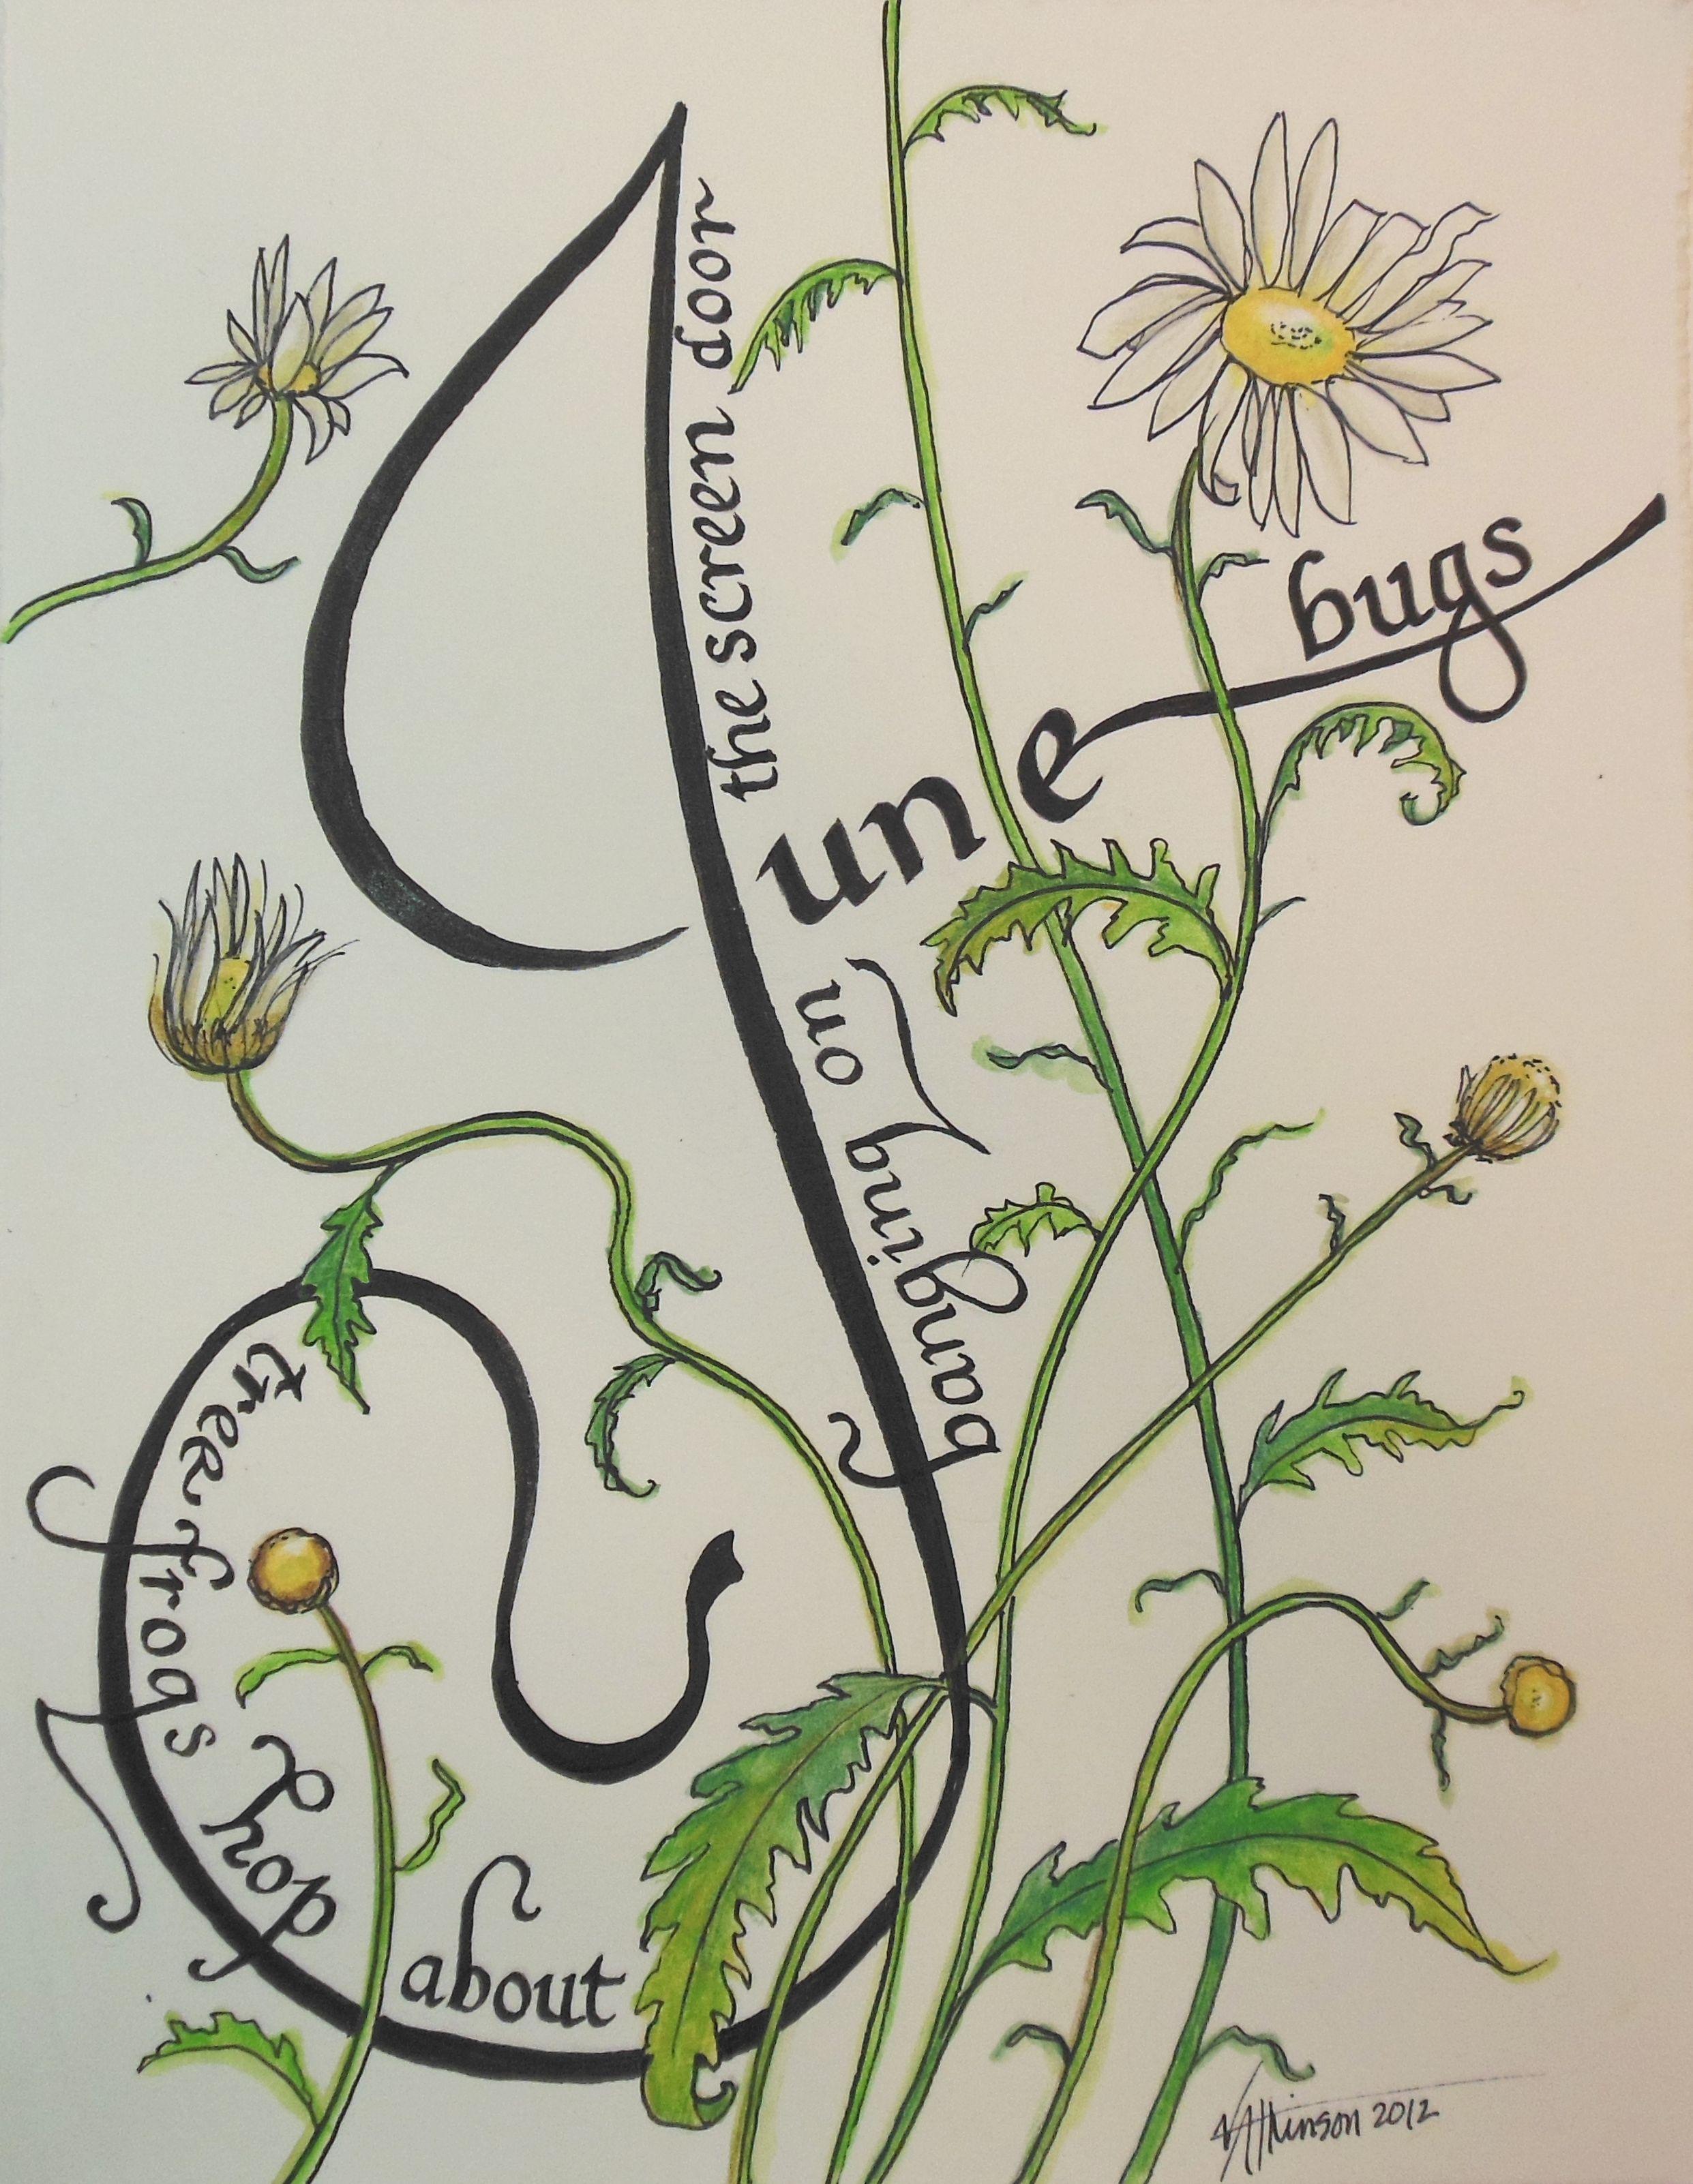 Calligraphy watercolor, June Bugs, 2012, V. Atkinson.